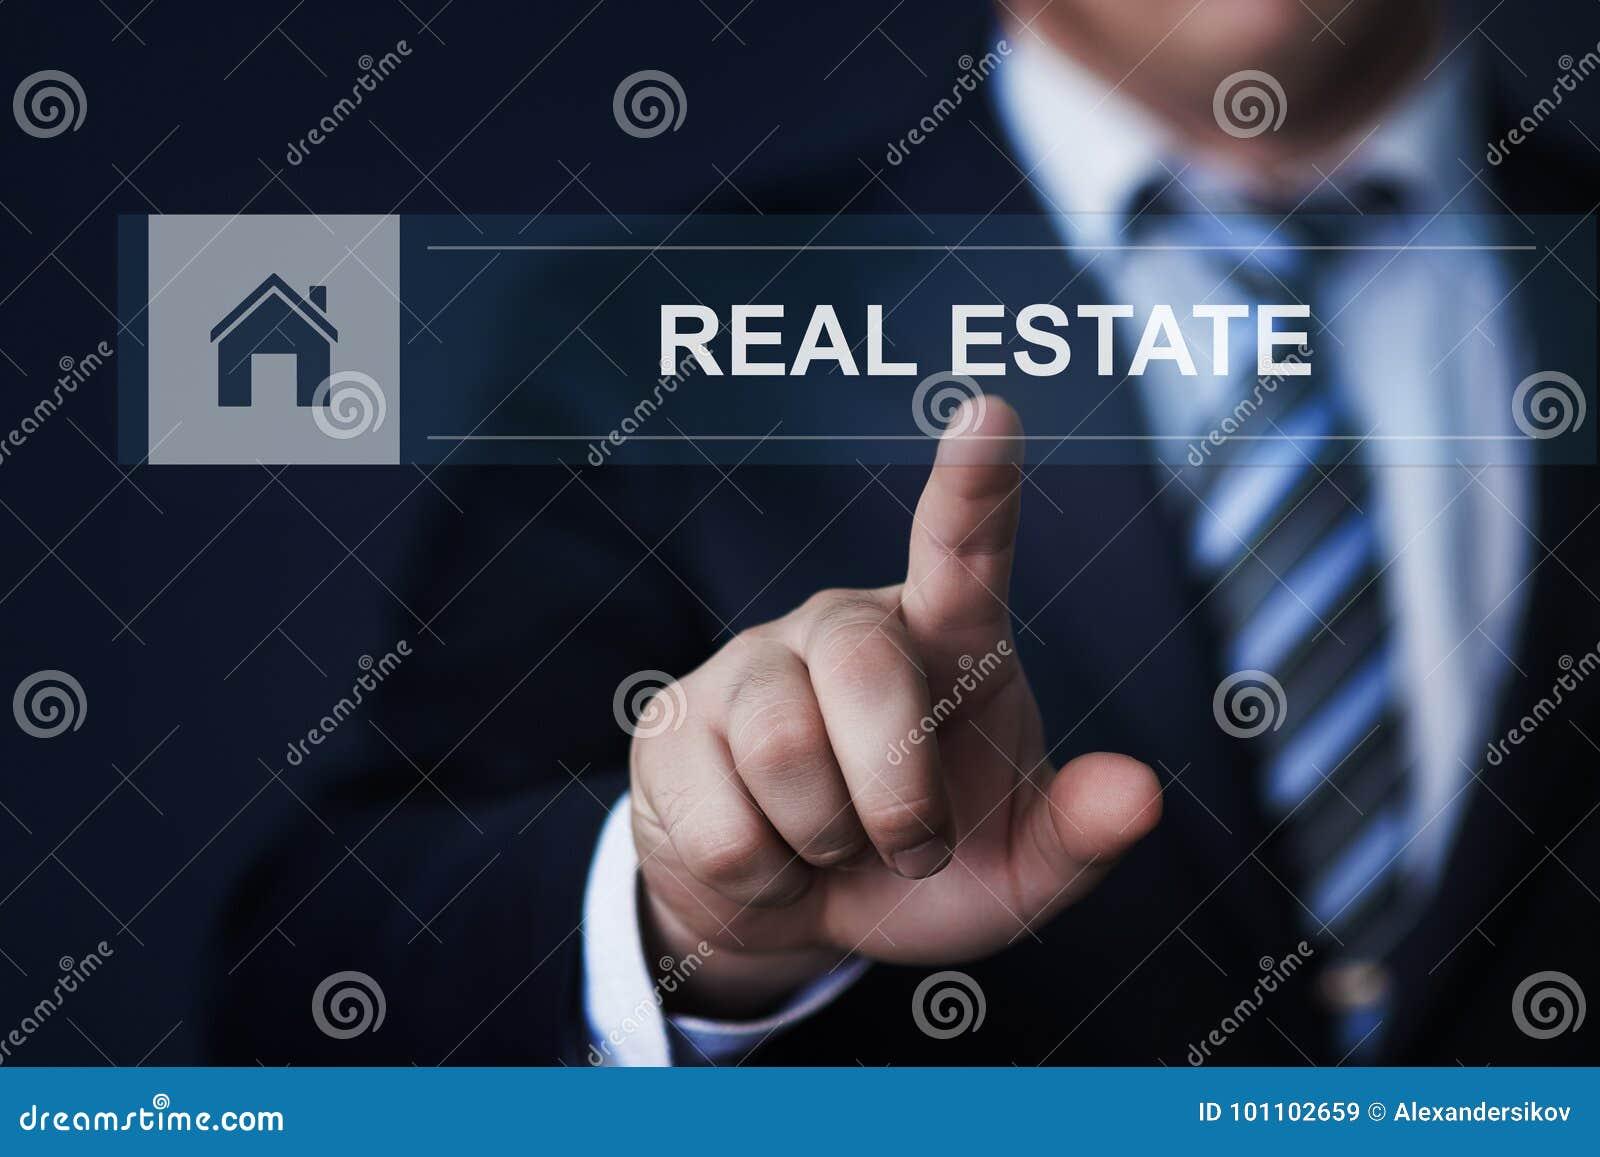 Real Estate Mortgage Property Management Rent Buy concept